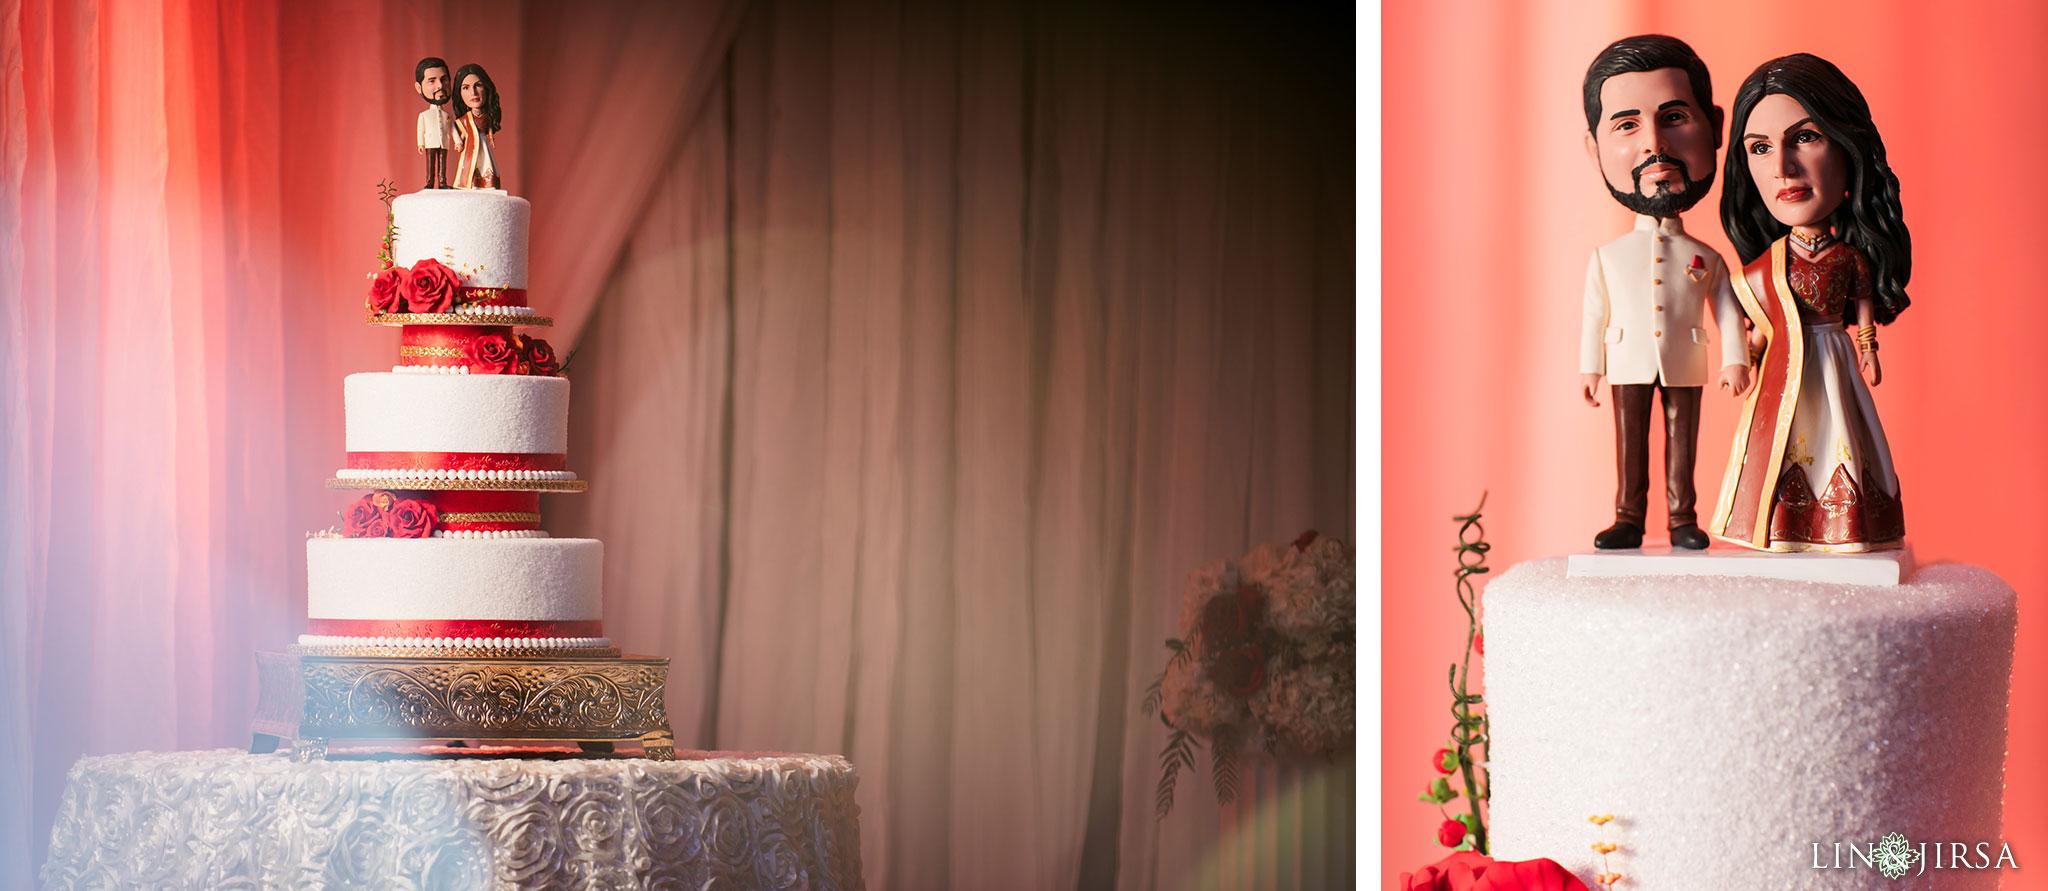 26 Diamond Bar Center Inland Empire Indian Wedding Photography